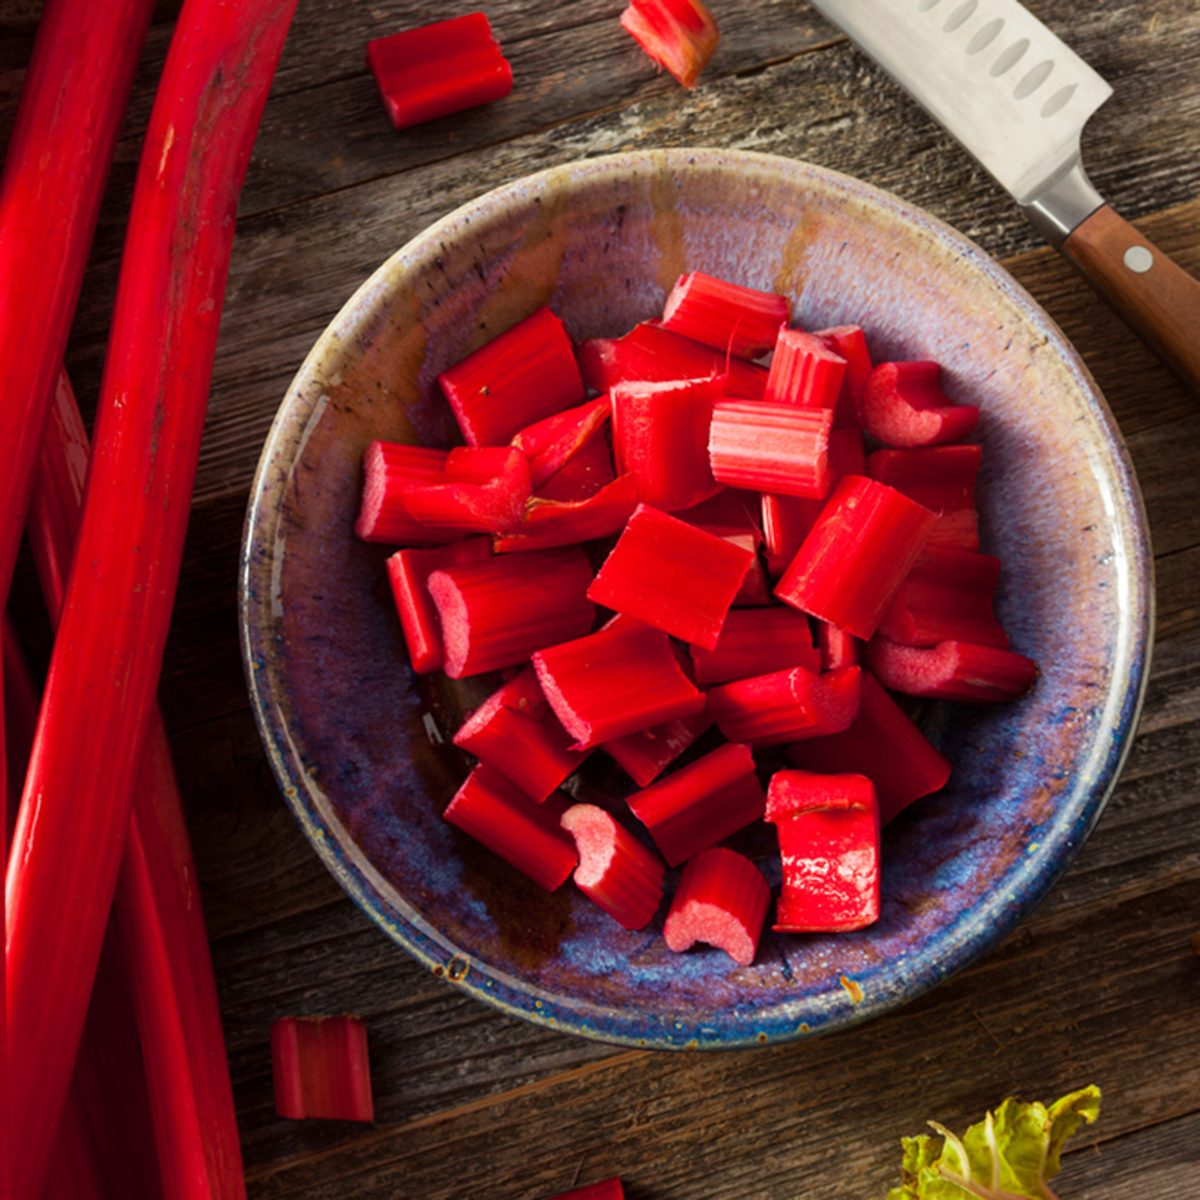 Raw Organic Red Rhubarb Ready to Use